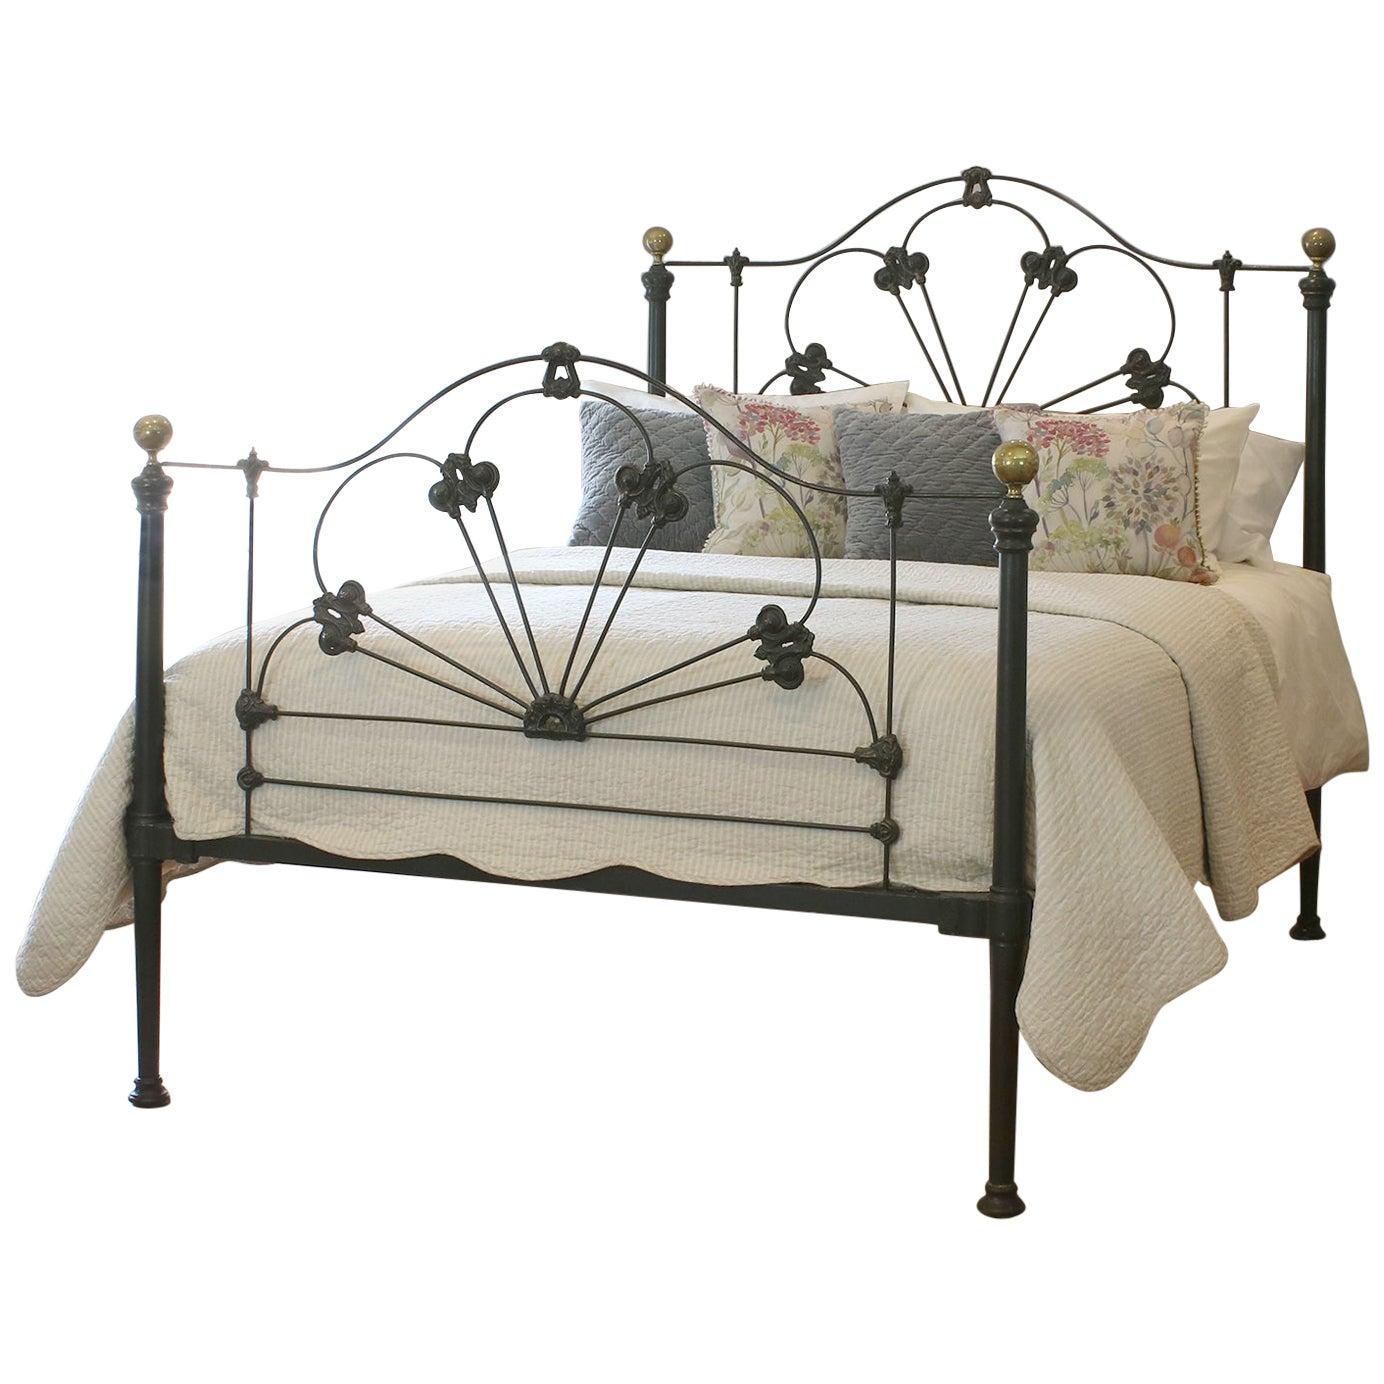 Cast Iron Mid Victorian Antique Bed MK226